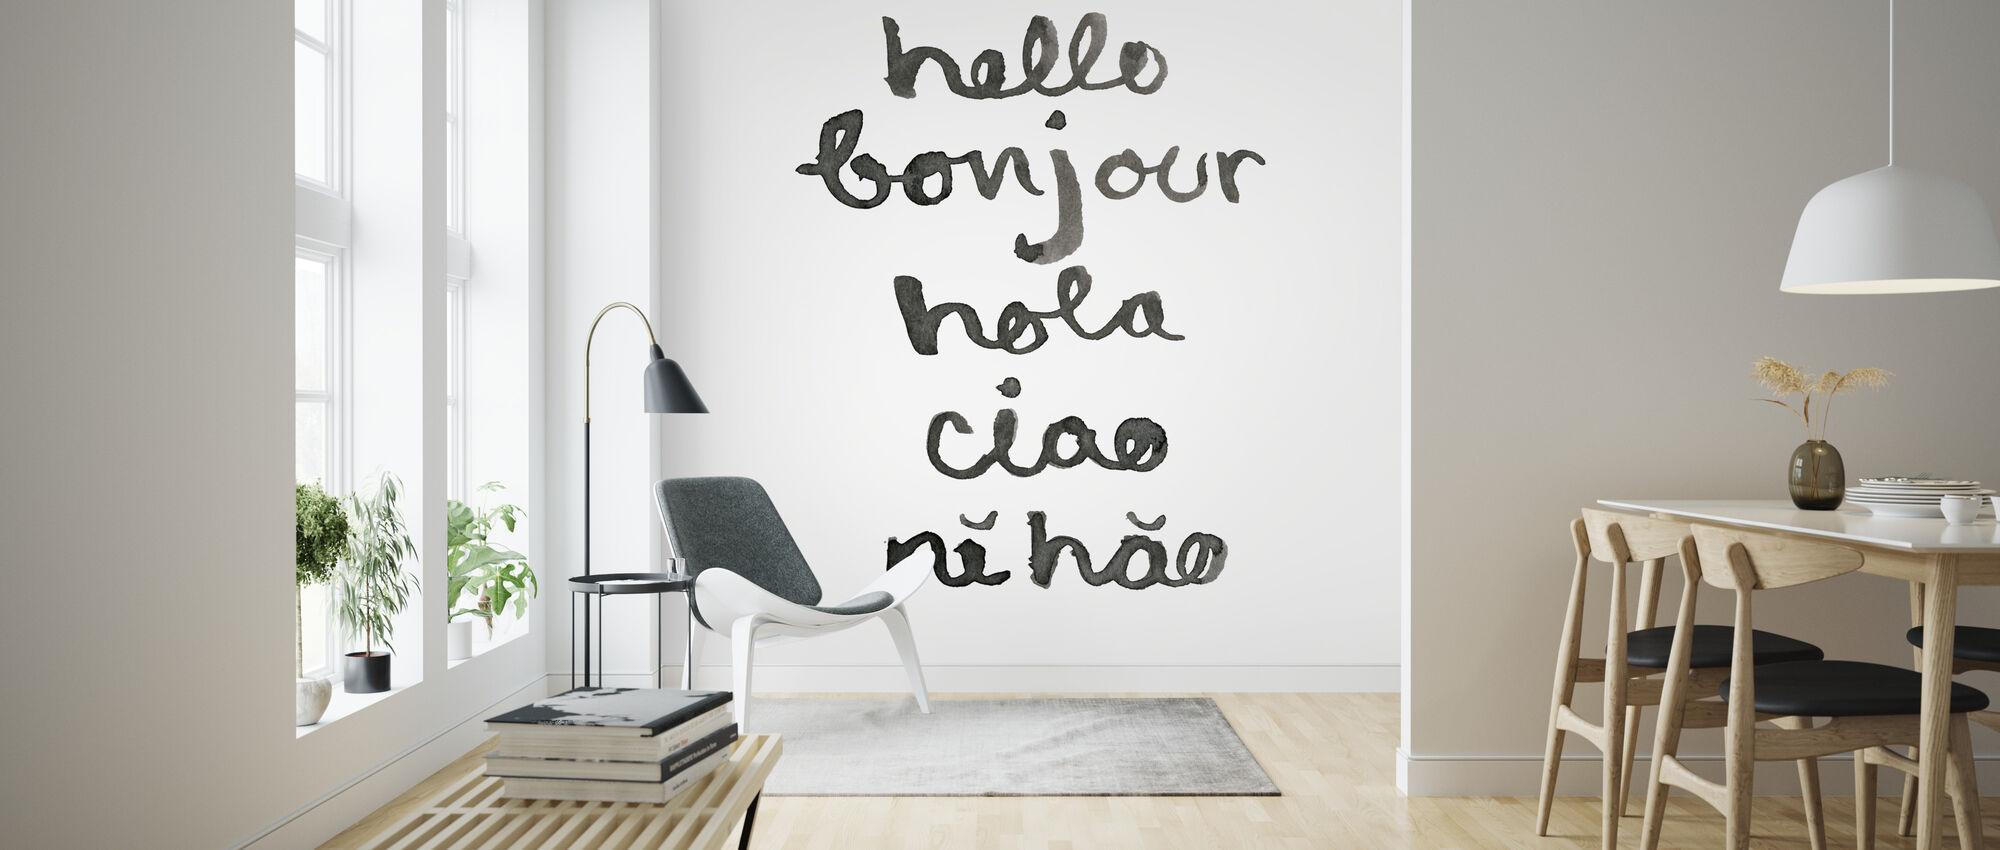 Hello Hello Hello - Wallpaper - Living Room